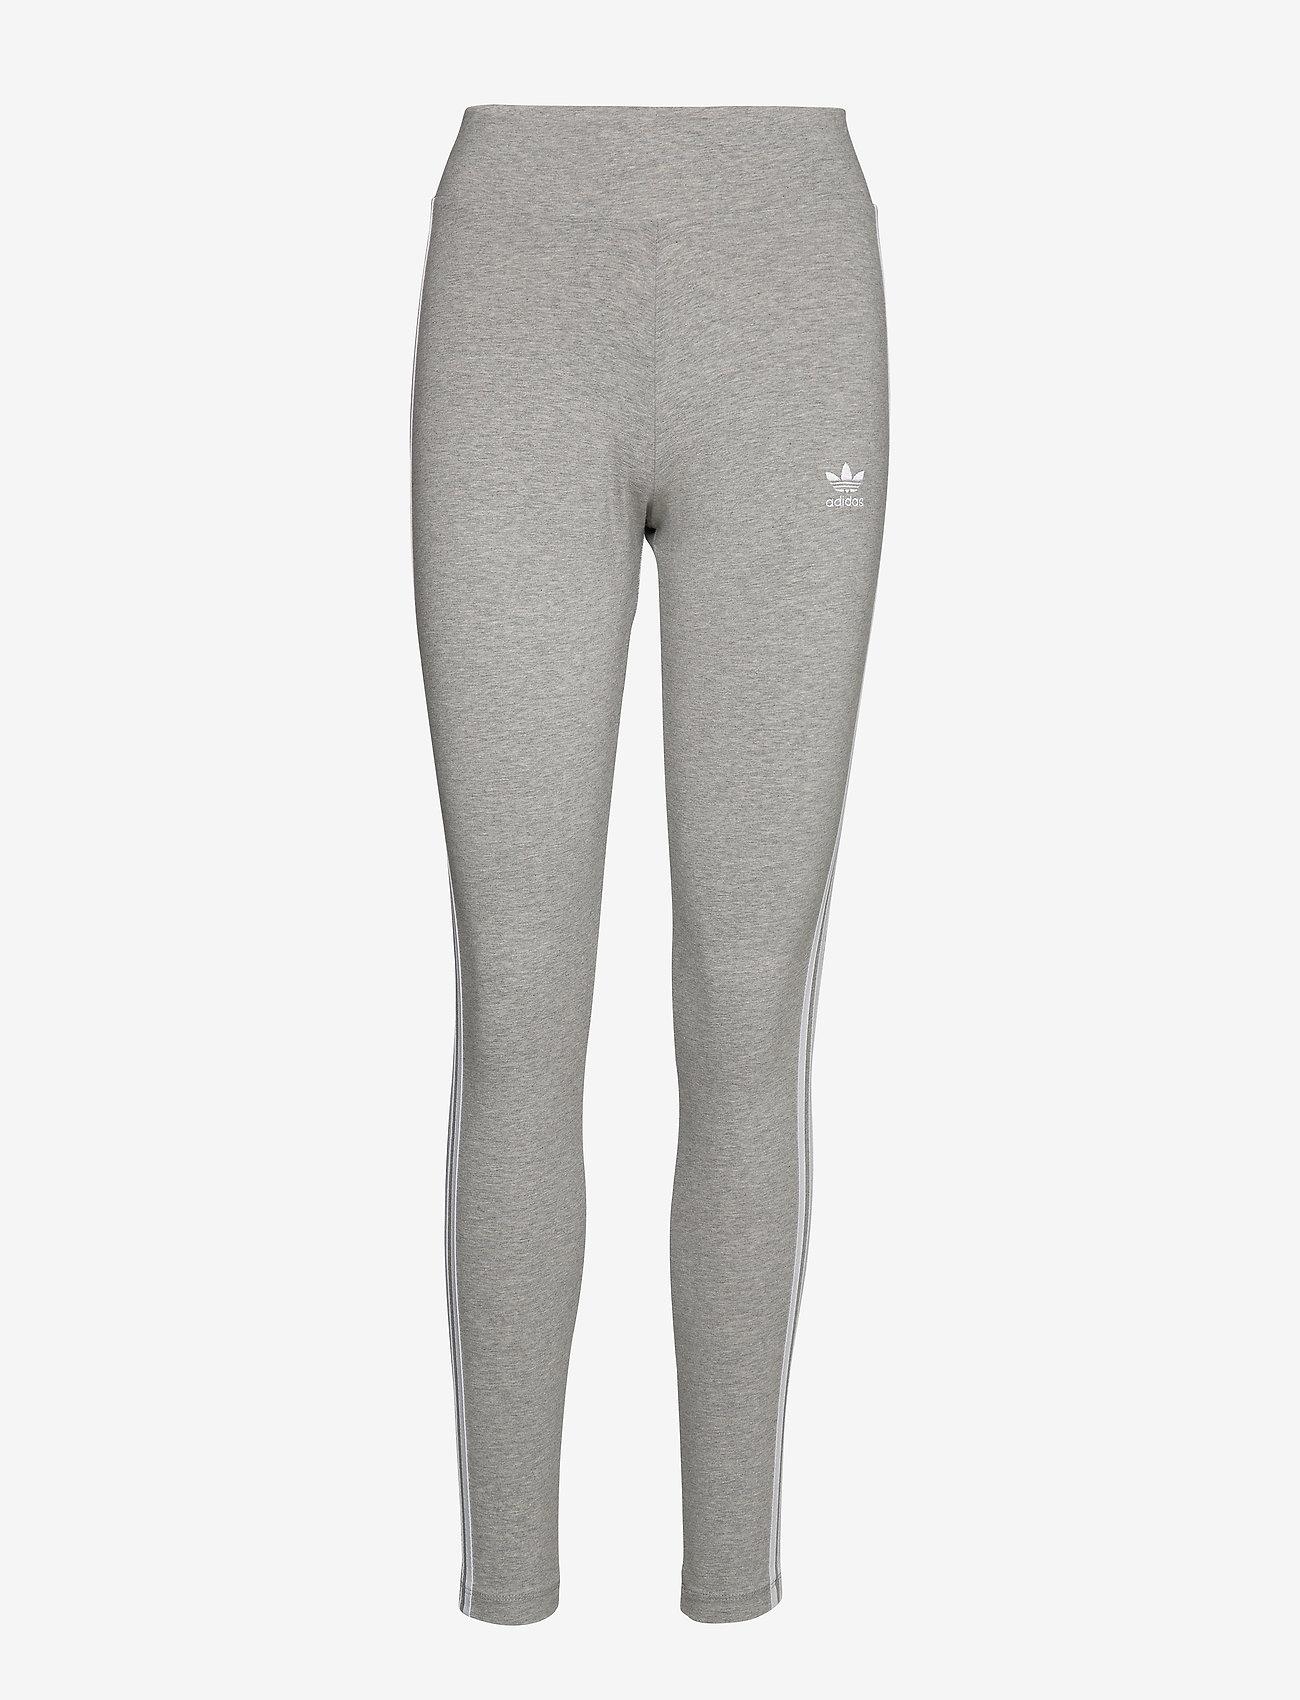 adidas Originals - 3 STRIPES TIGHT - running & training tights - mgreyh/white - 1